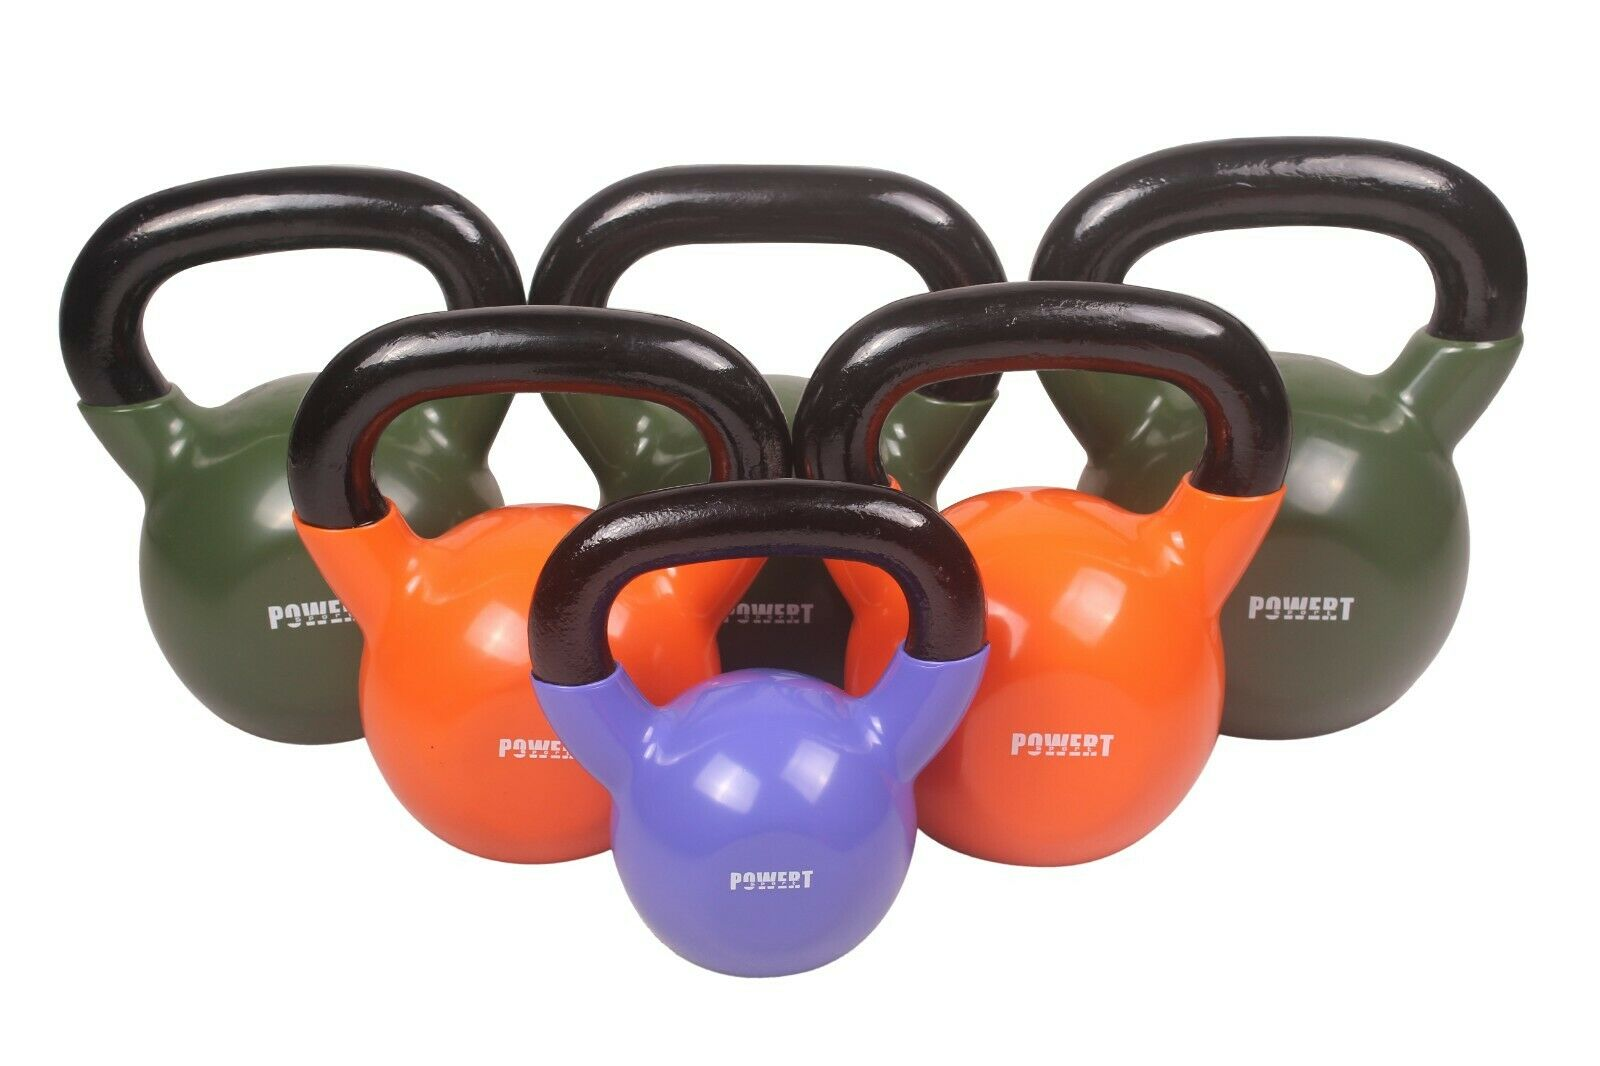 POWERT Vinyl Coated Kettlebell for Weight Lifting Workout 5-50LB–Single